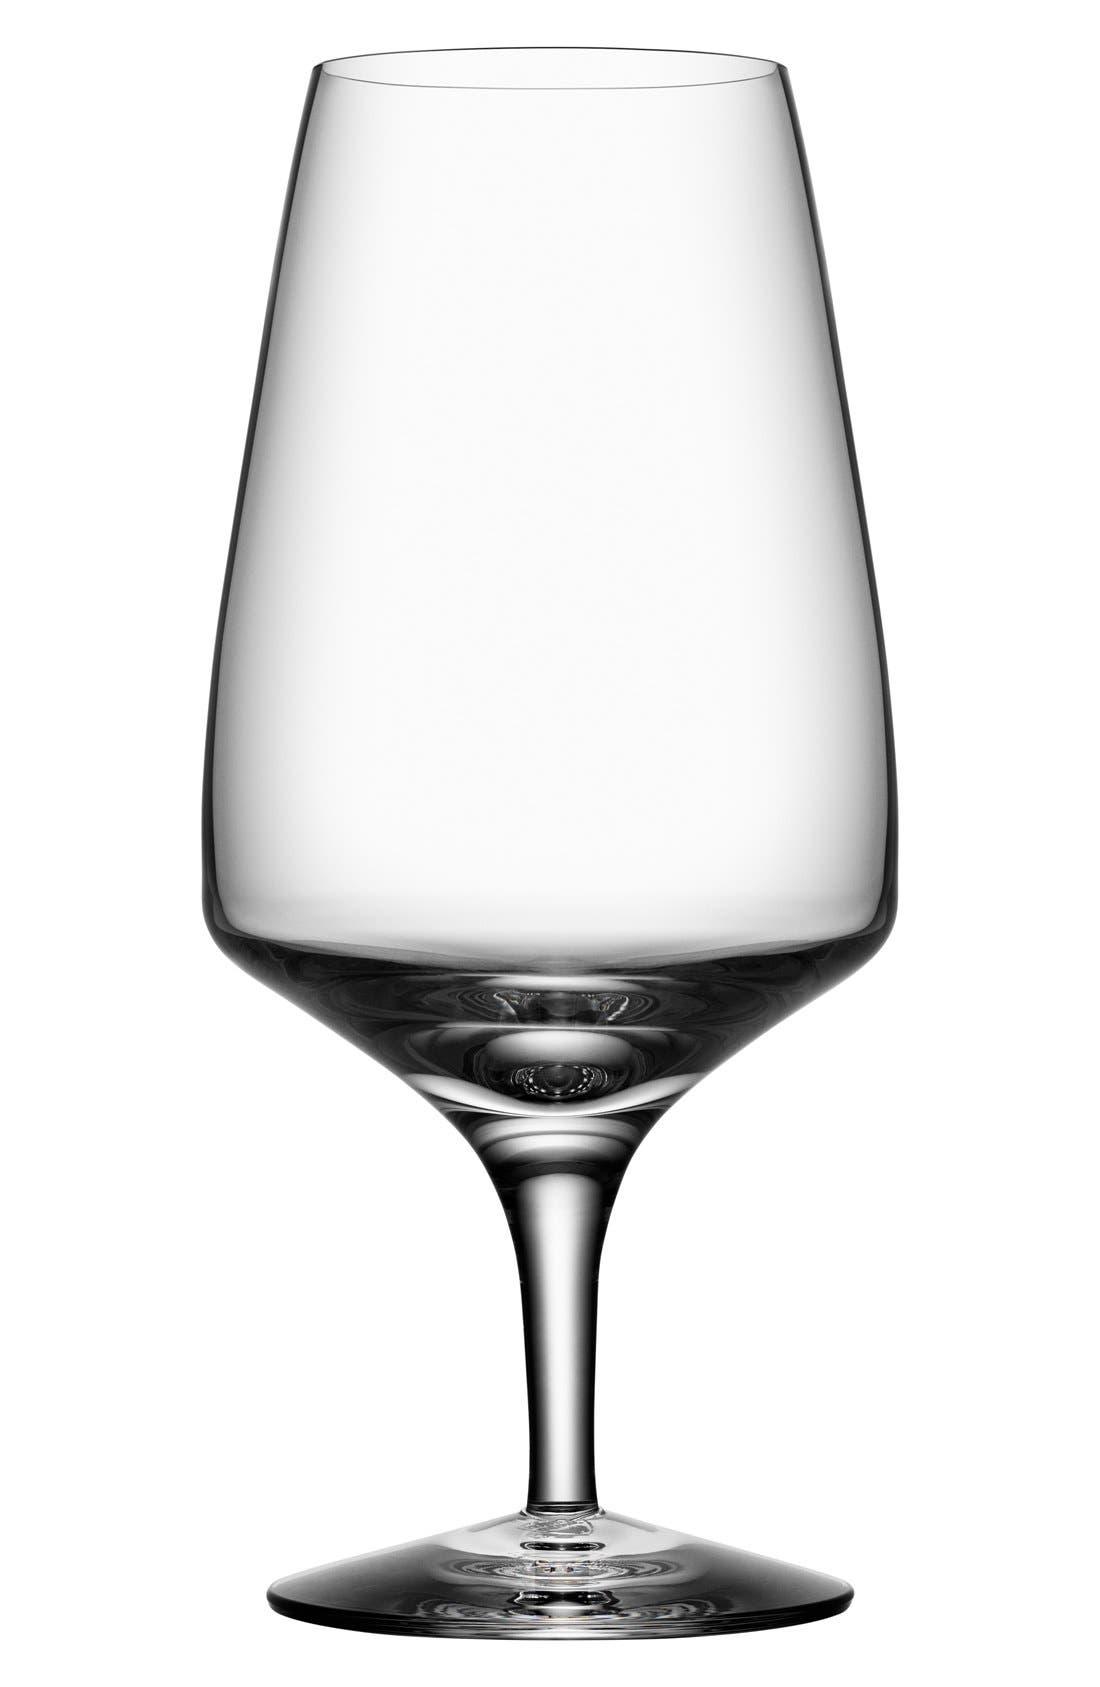 Alternate Image 1 Selected - Orrefors 'Pulse' Leaded Crystal Beer Glasses (Set of 4)